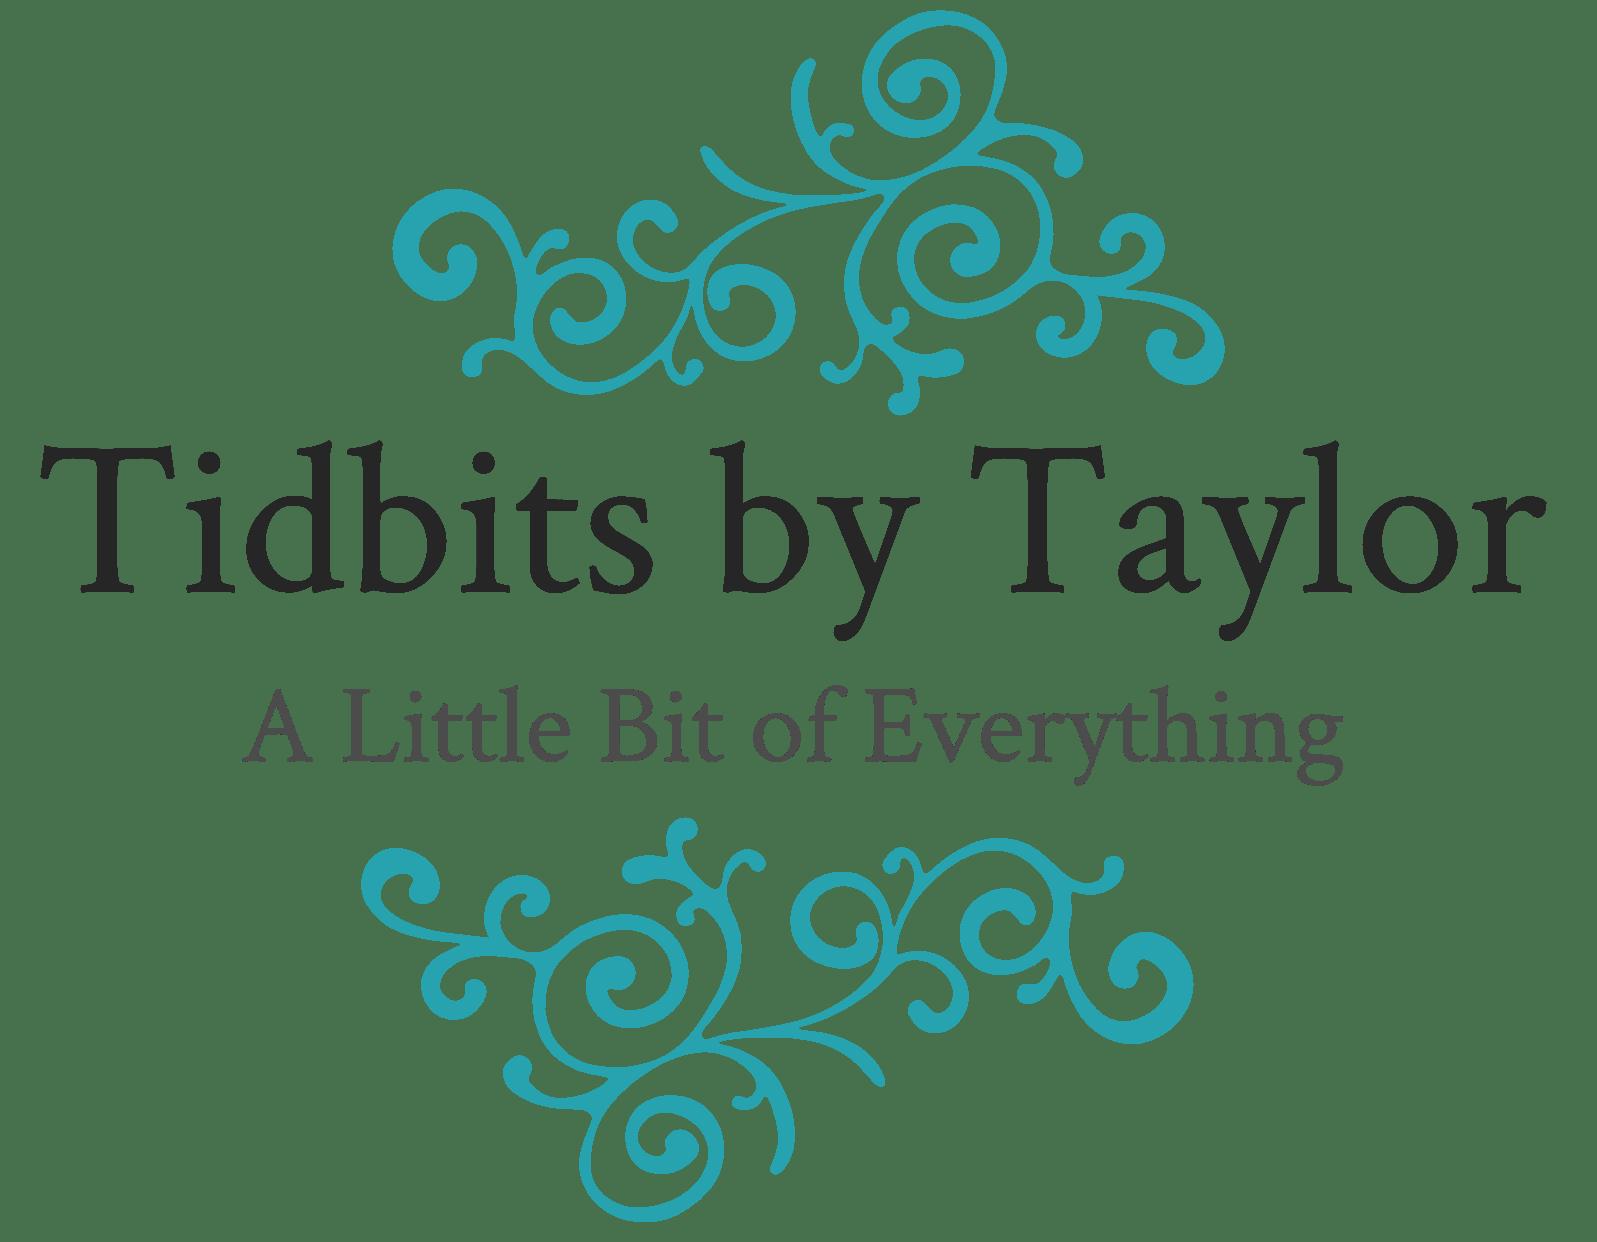 Tidbits by Taylor